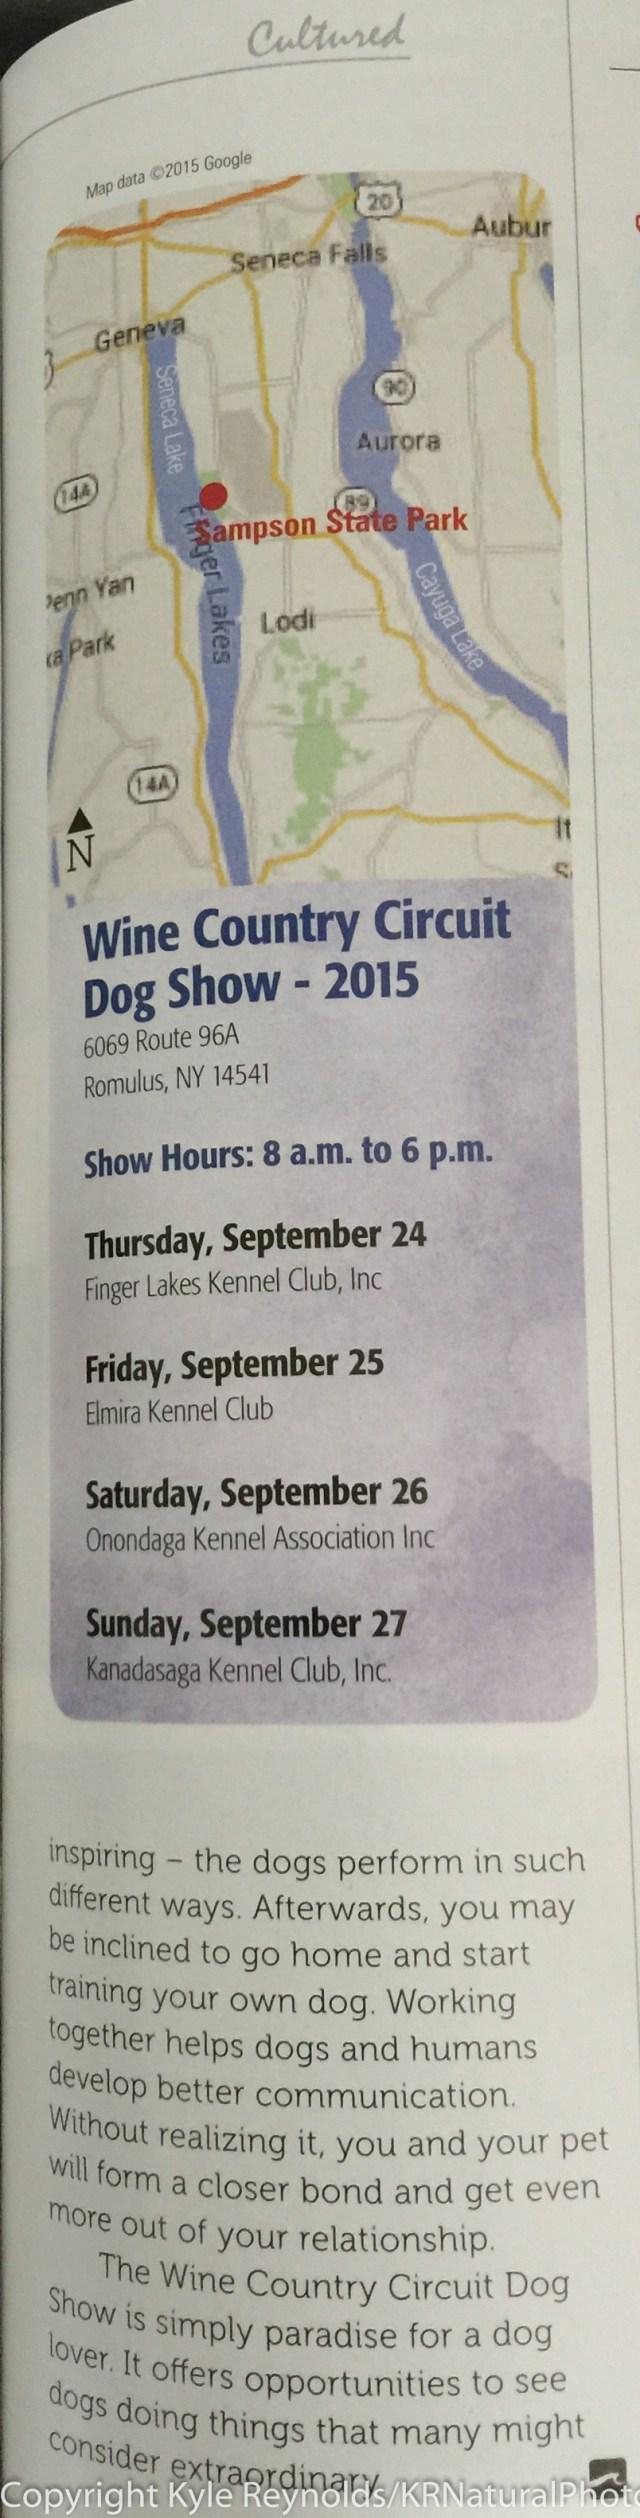 LIFL mag - dog show articleSeptember 14, 2015_6-2